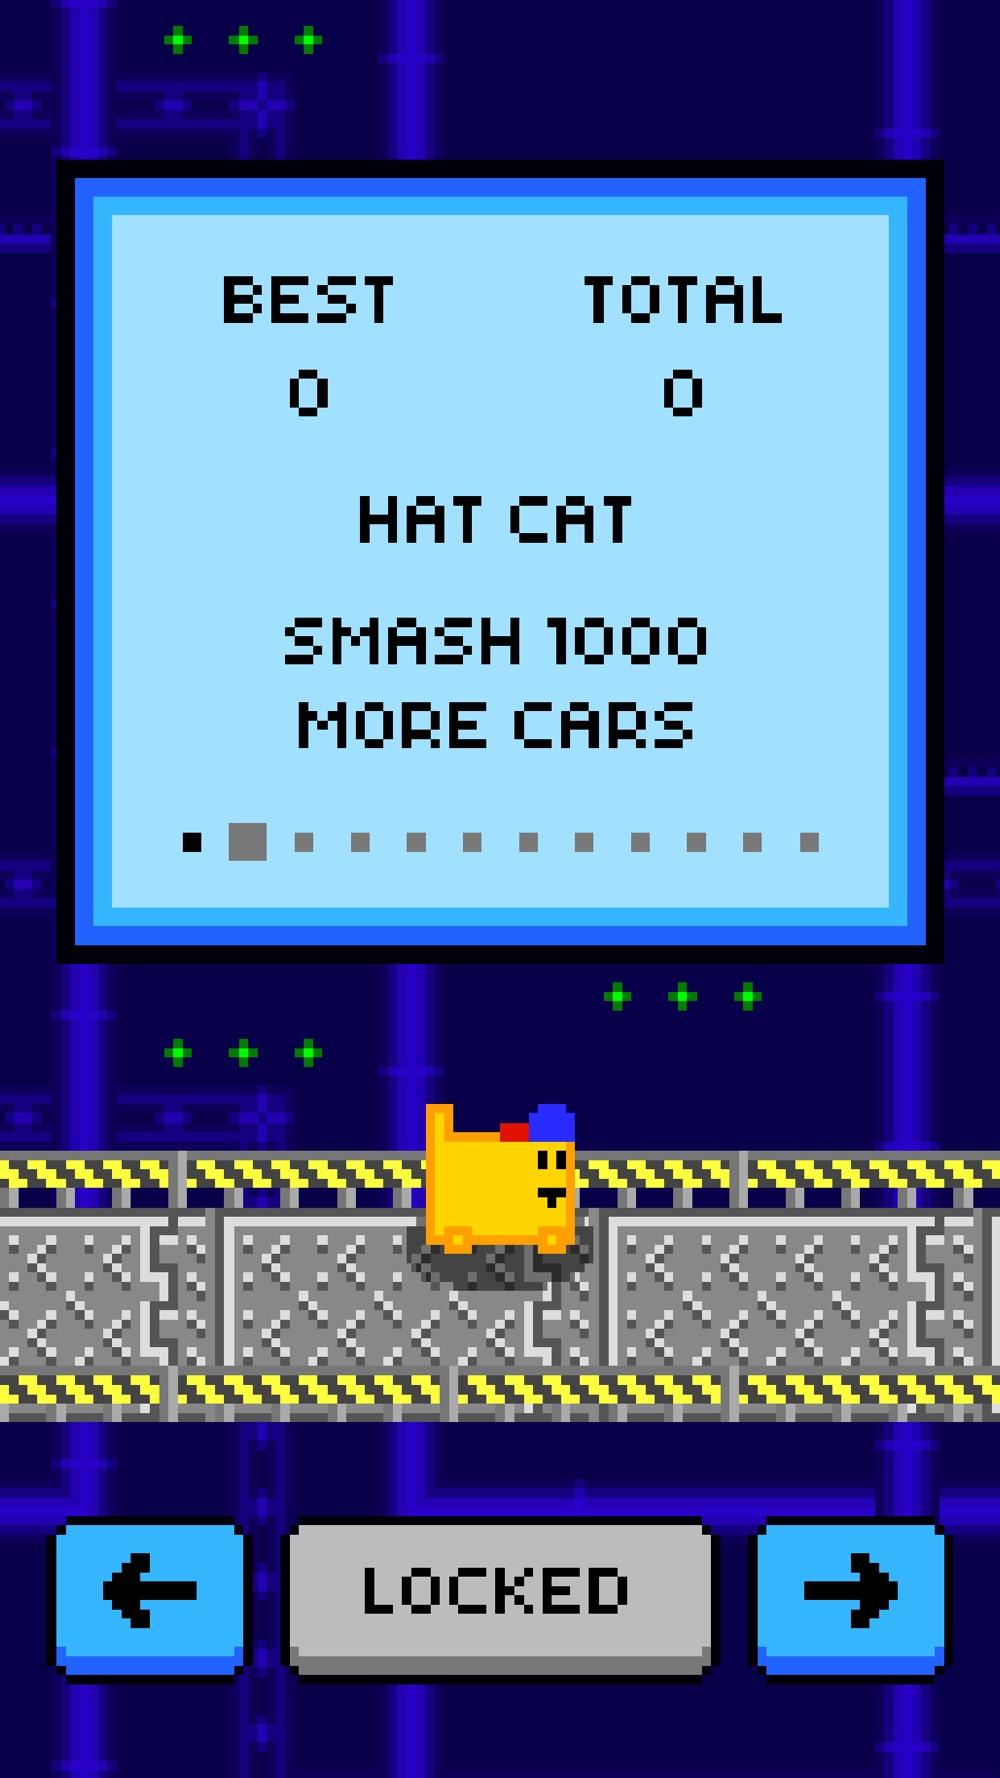 Box Cat Bash hack tool